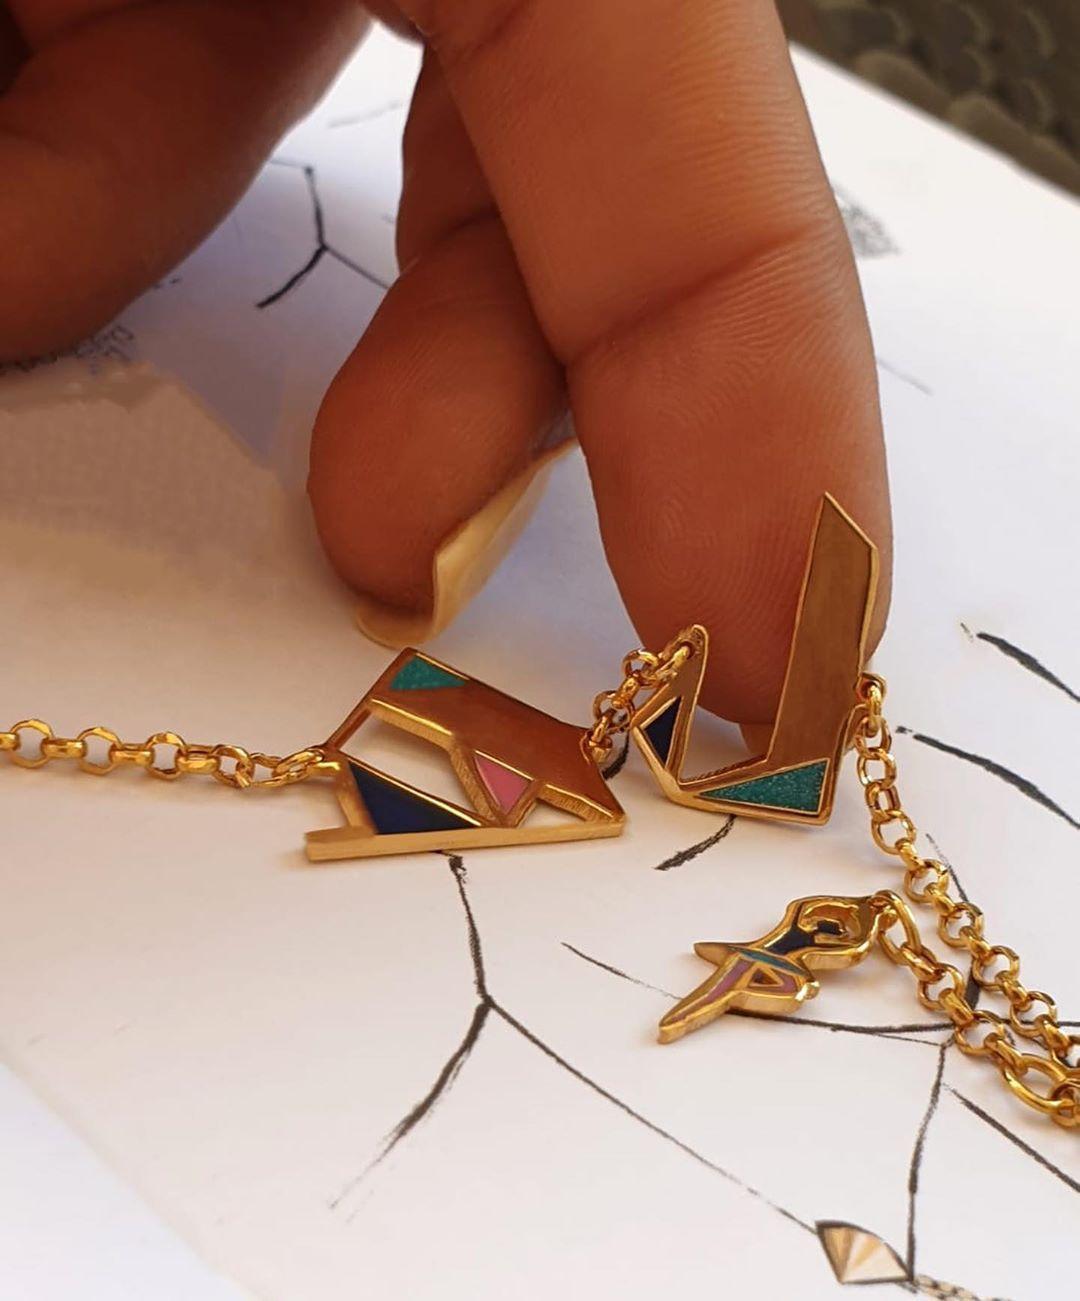 Arabic Letters Lam Haa Geometric Bellylady Pendant Gold 21 Karat Customized Bracelet Design Geometric Co Baby Shower Princess Baby Princess Arrow Necklace